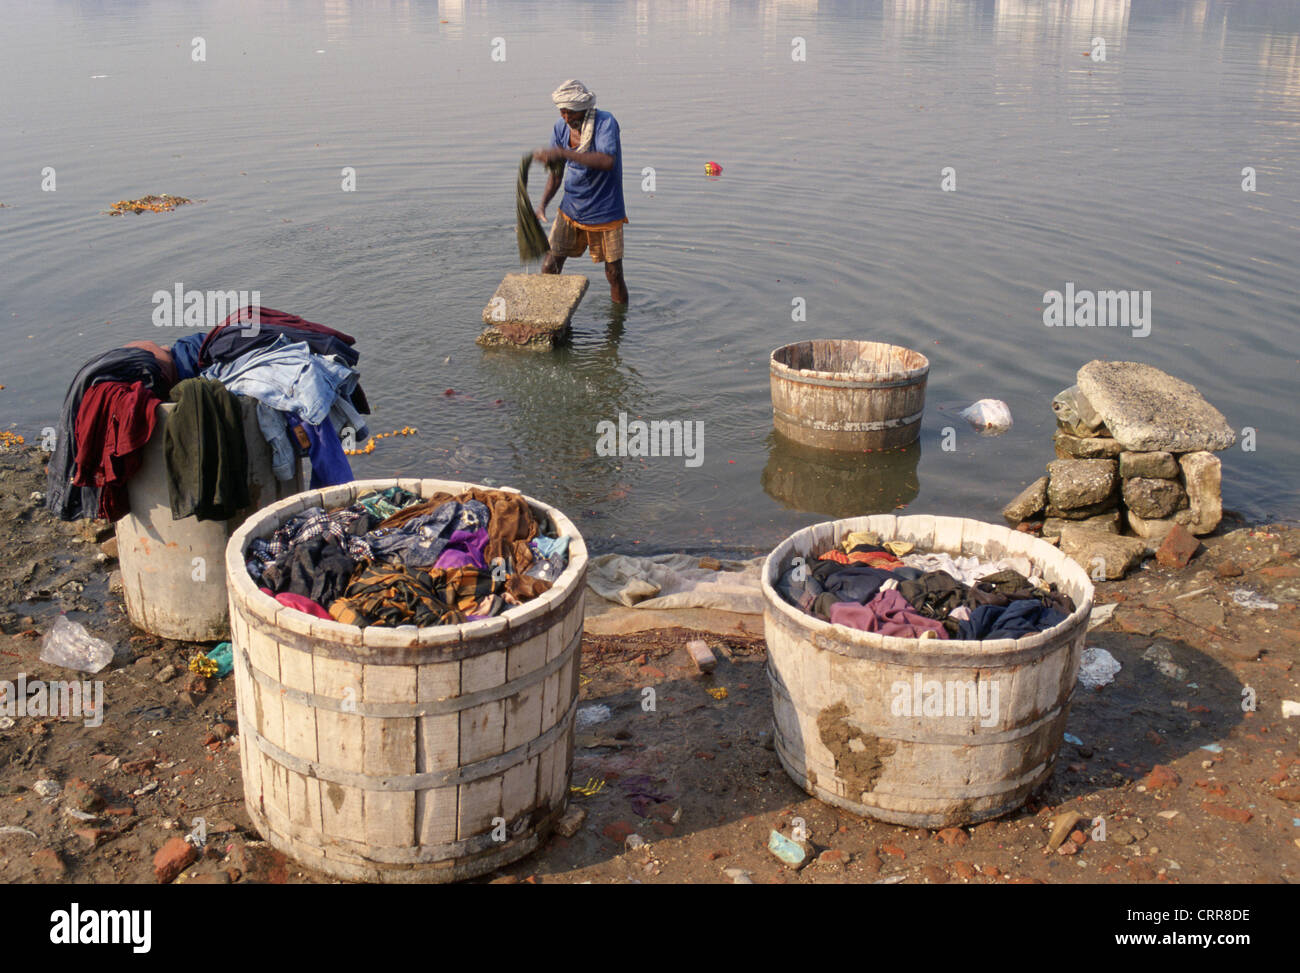 Man washing clothes in the Sabarmati river ( India) - Stock Image